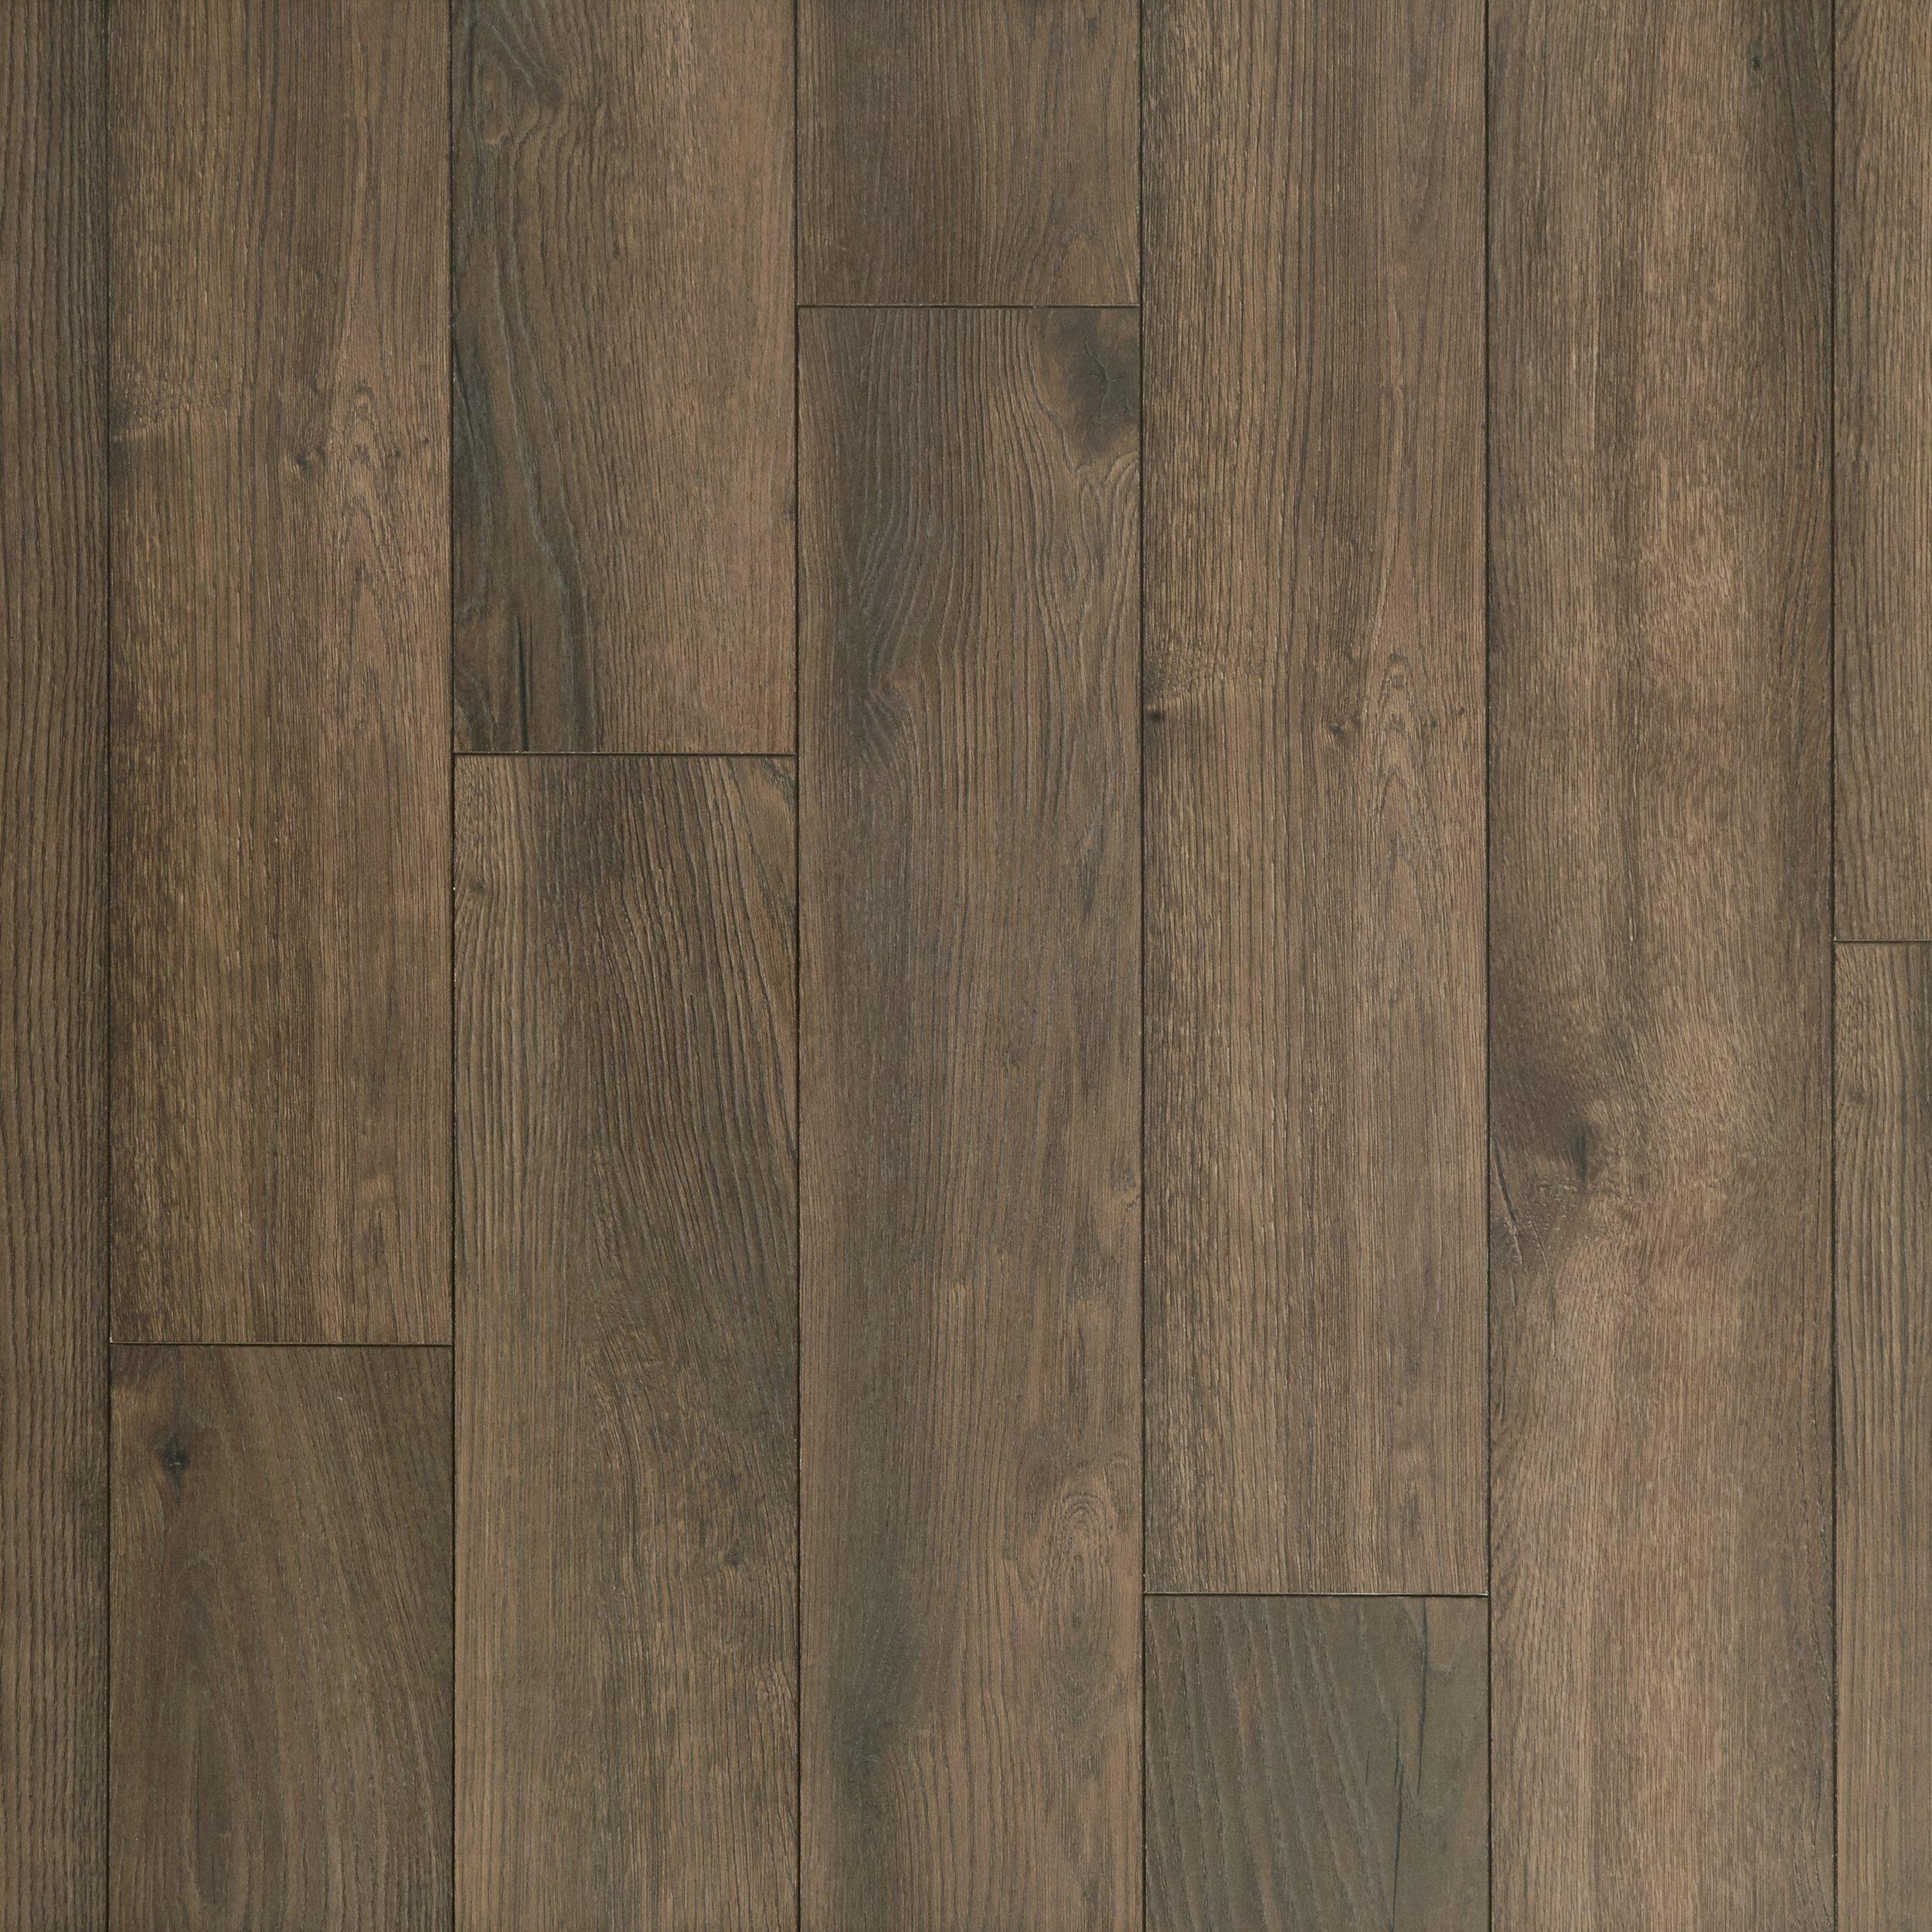 Dark Umber Oak Matte Laminate Painted Furniture Laminate Colours Flooring